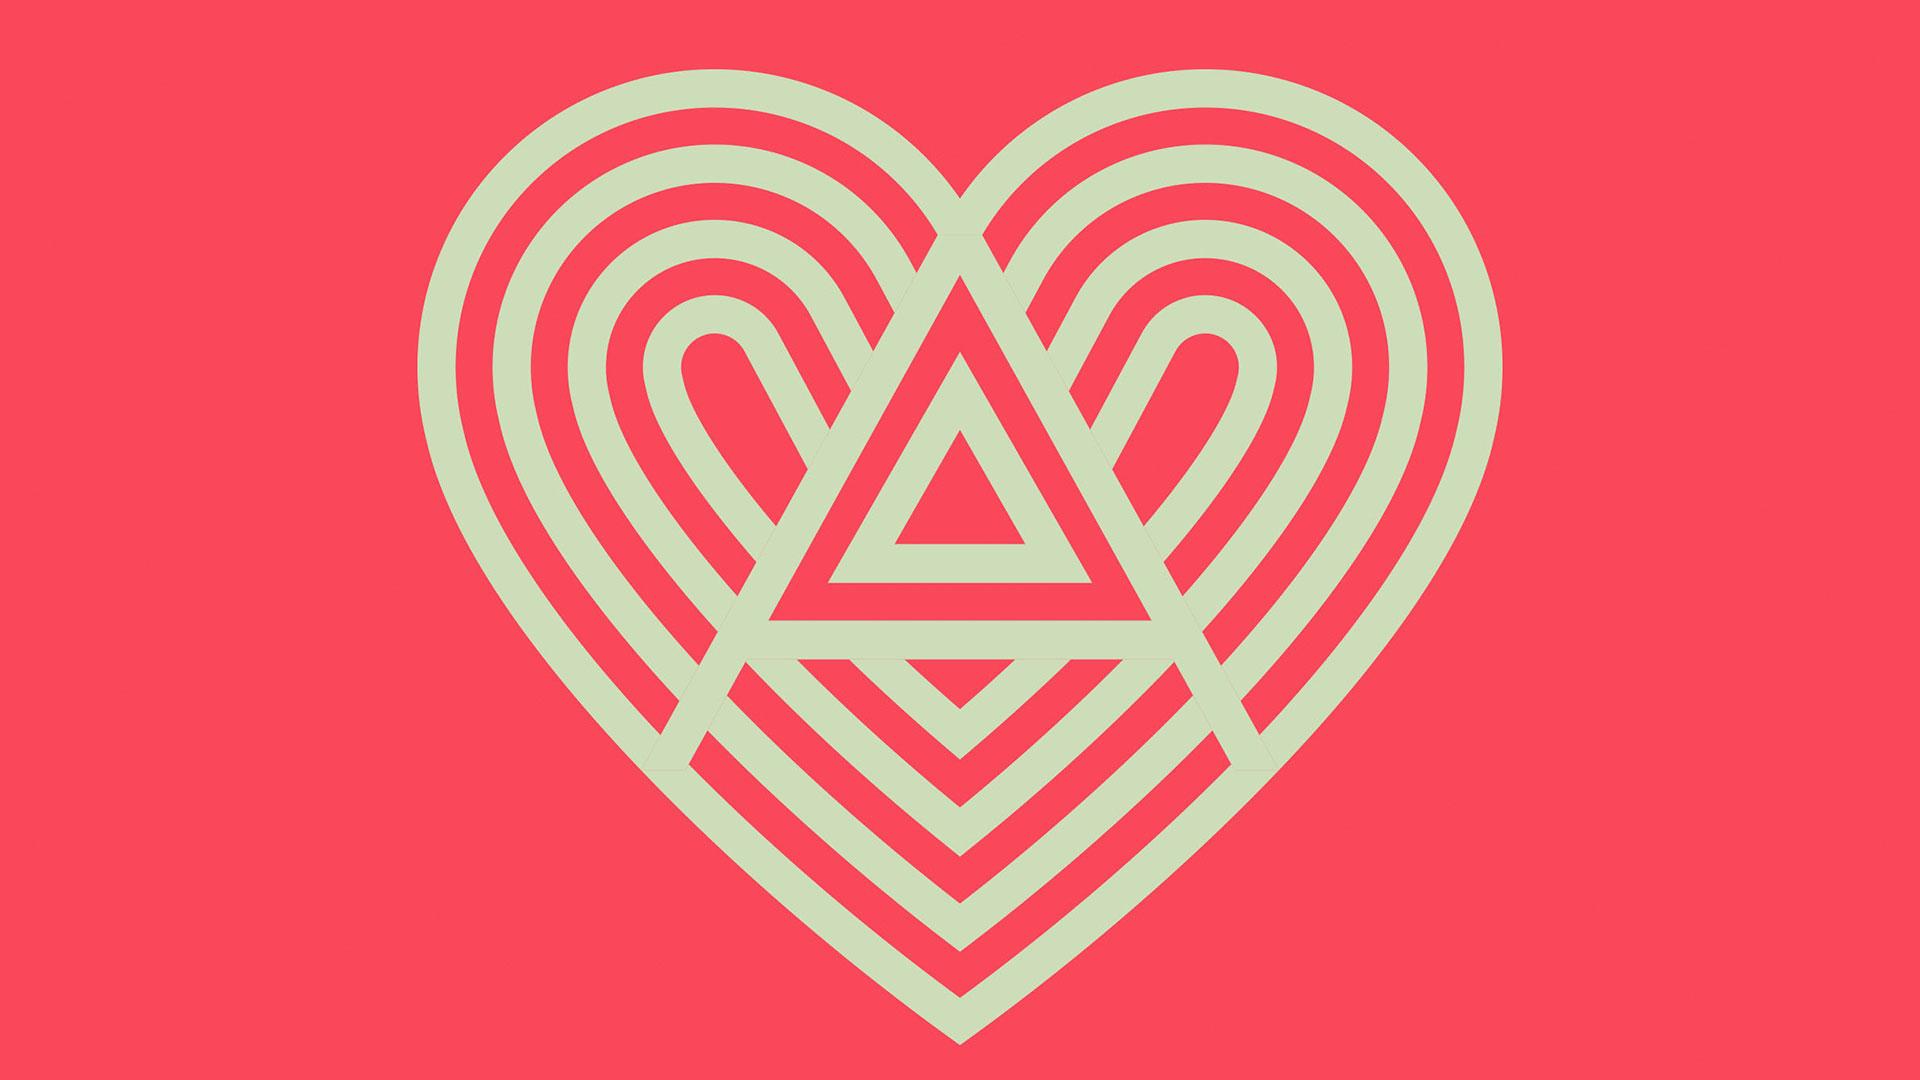 Heart Ibiza hero asset